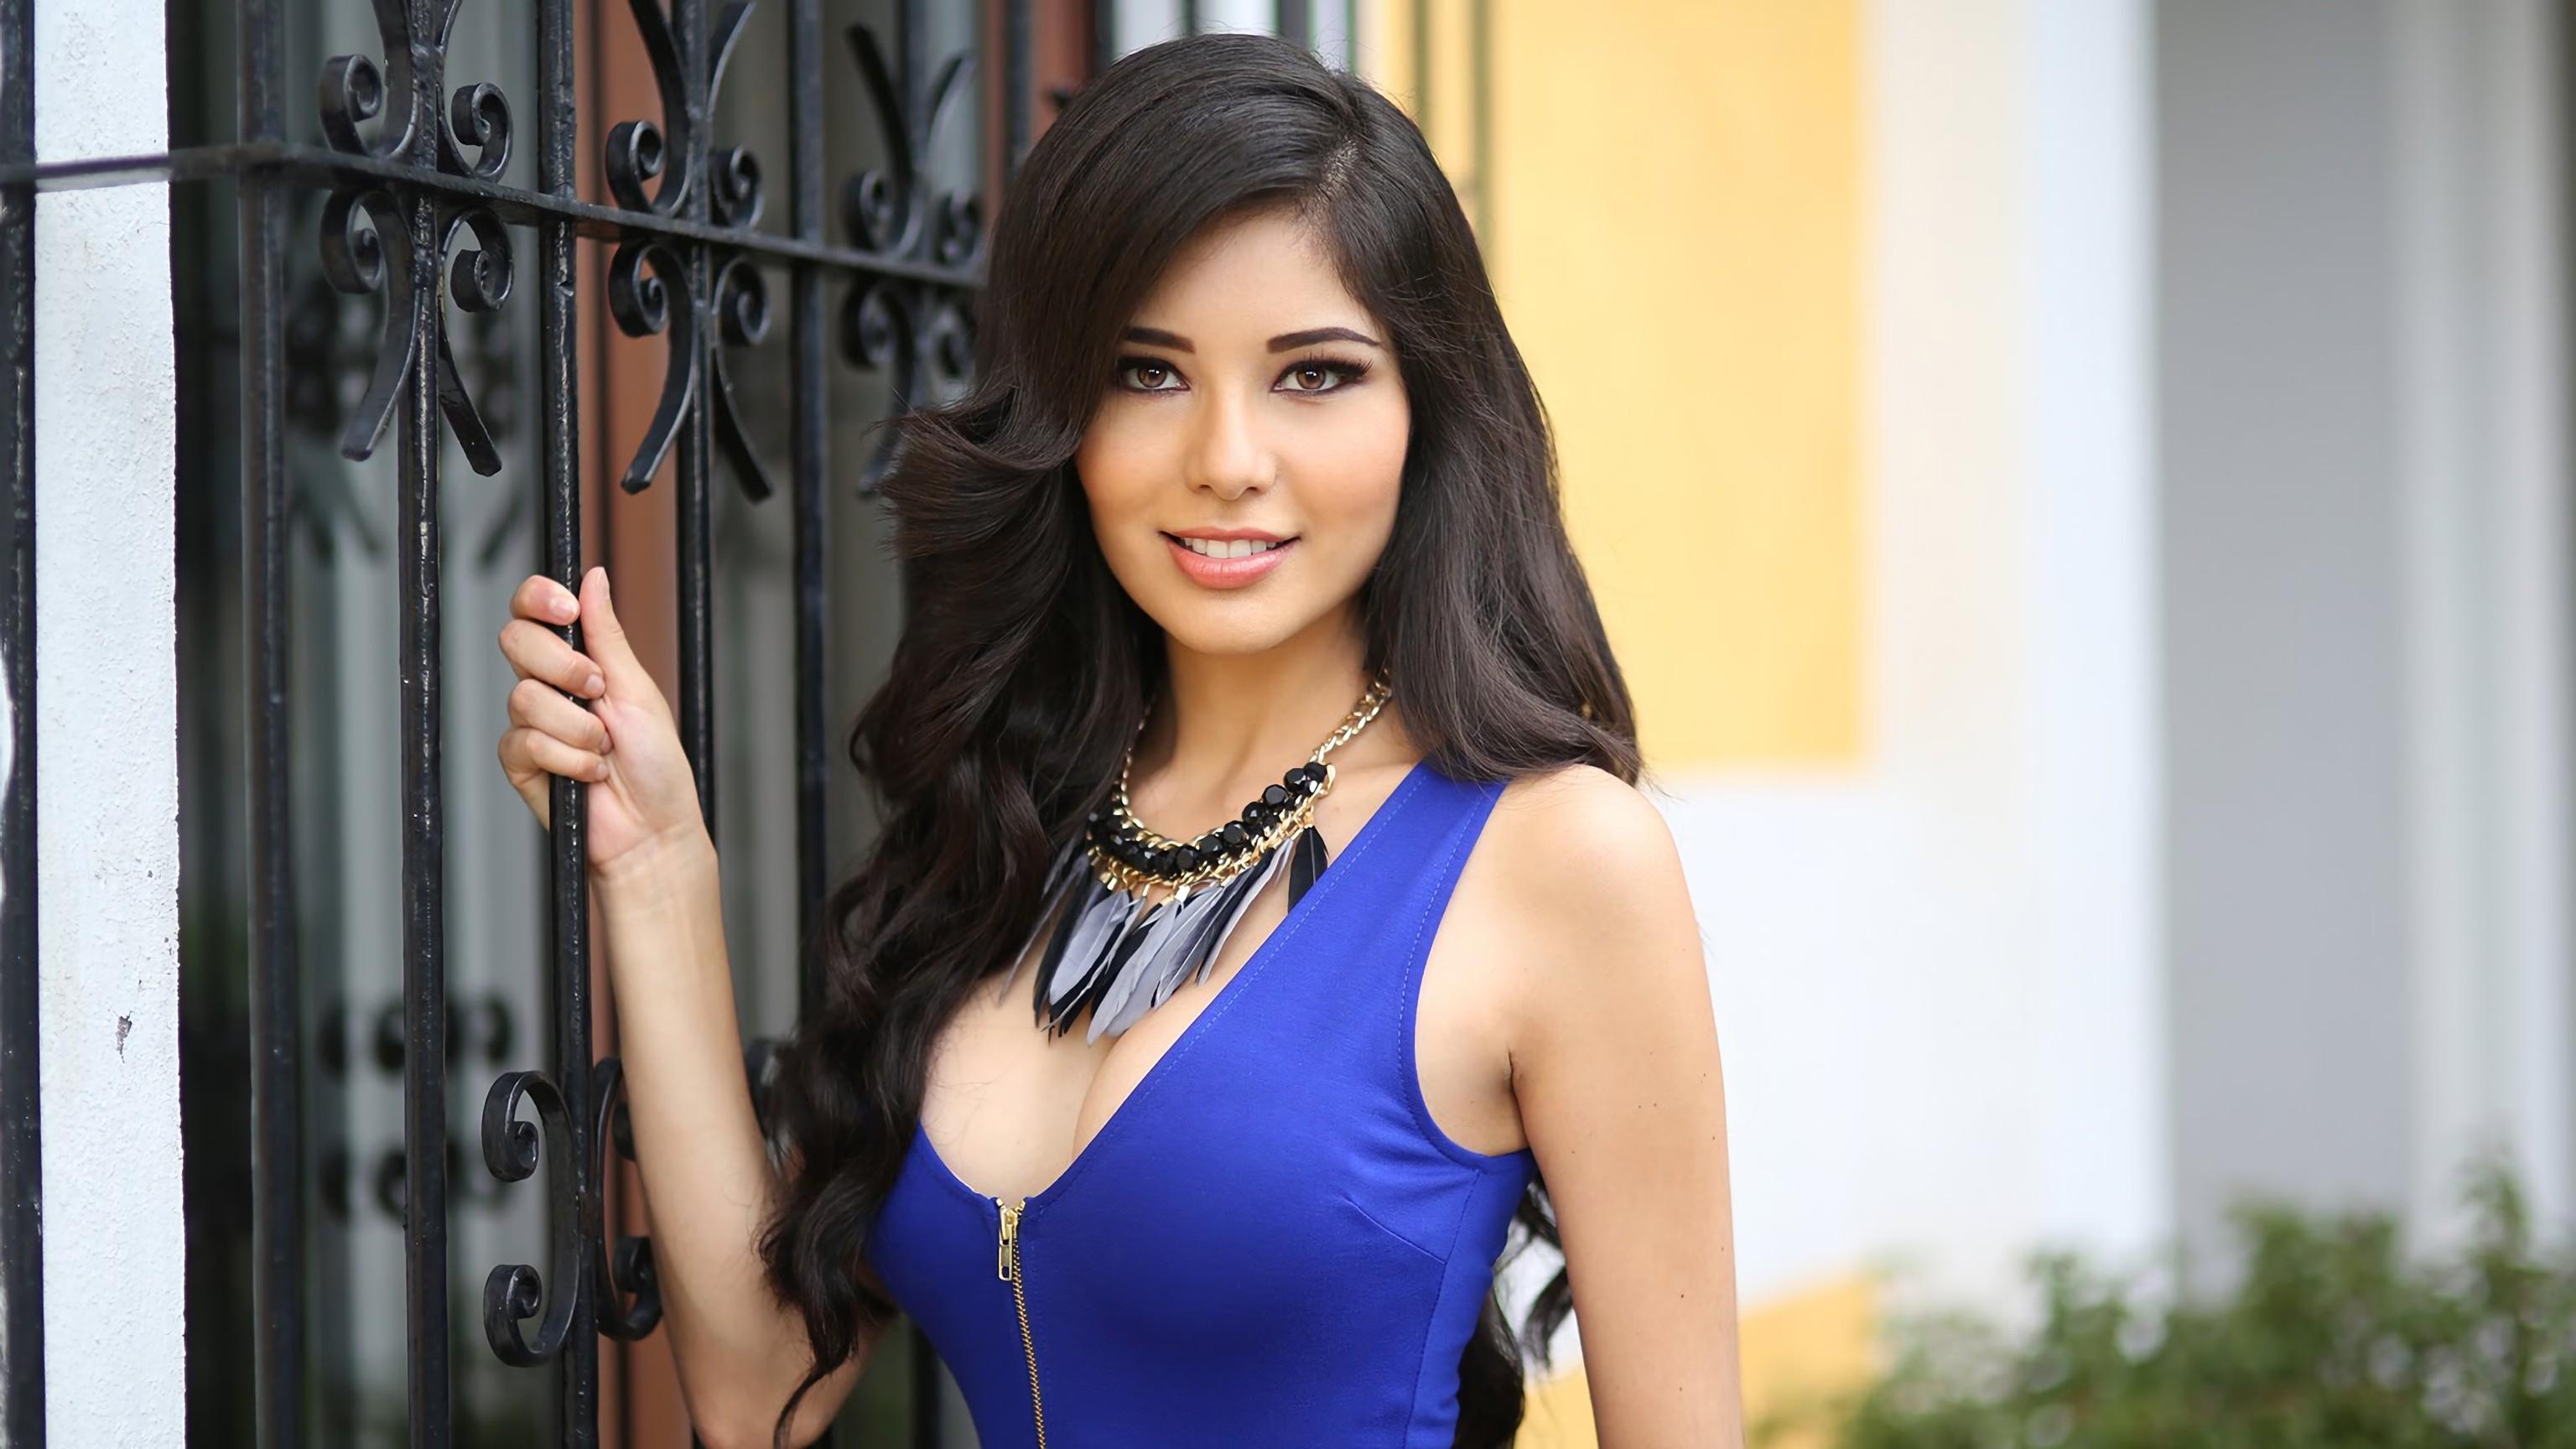 mexican-women-models